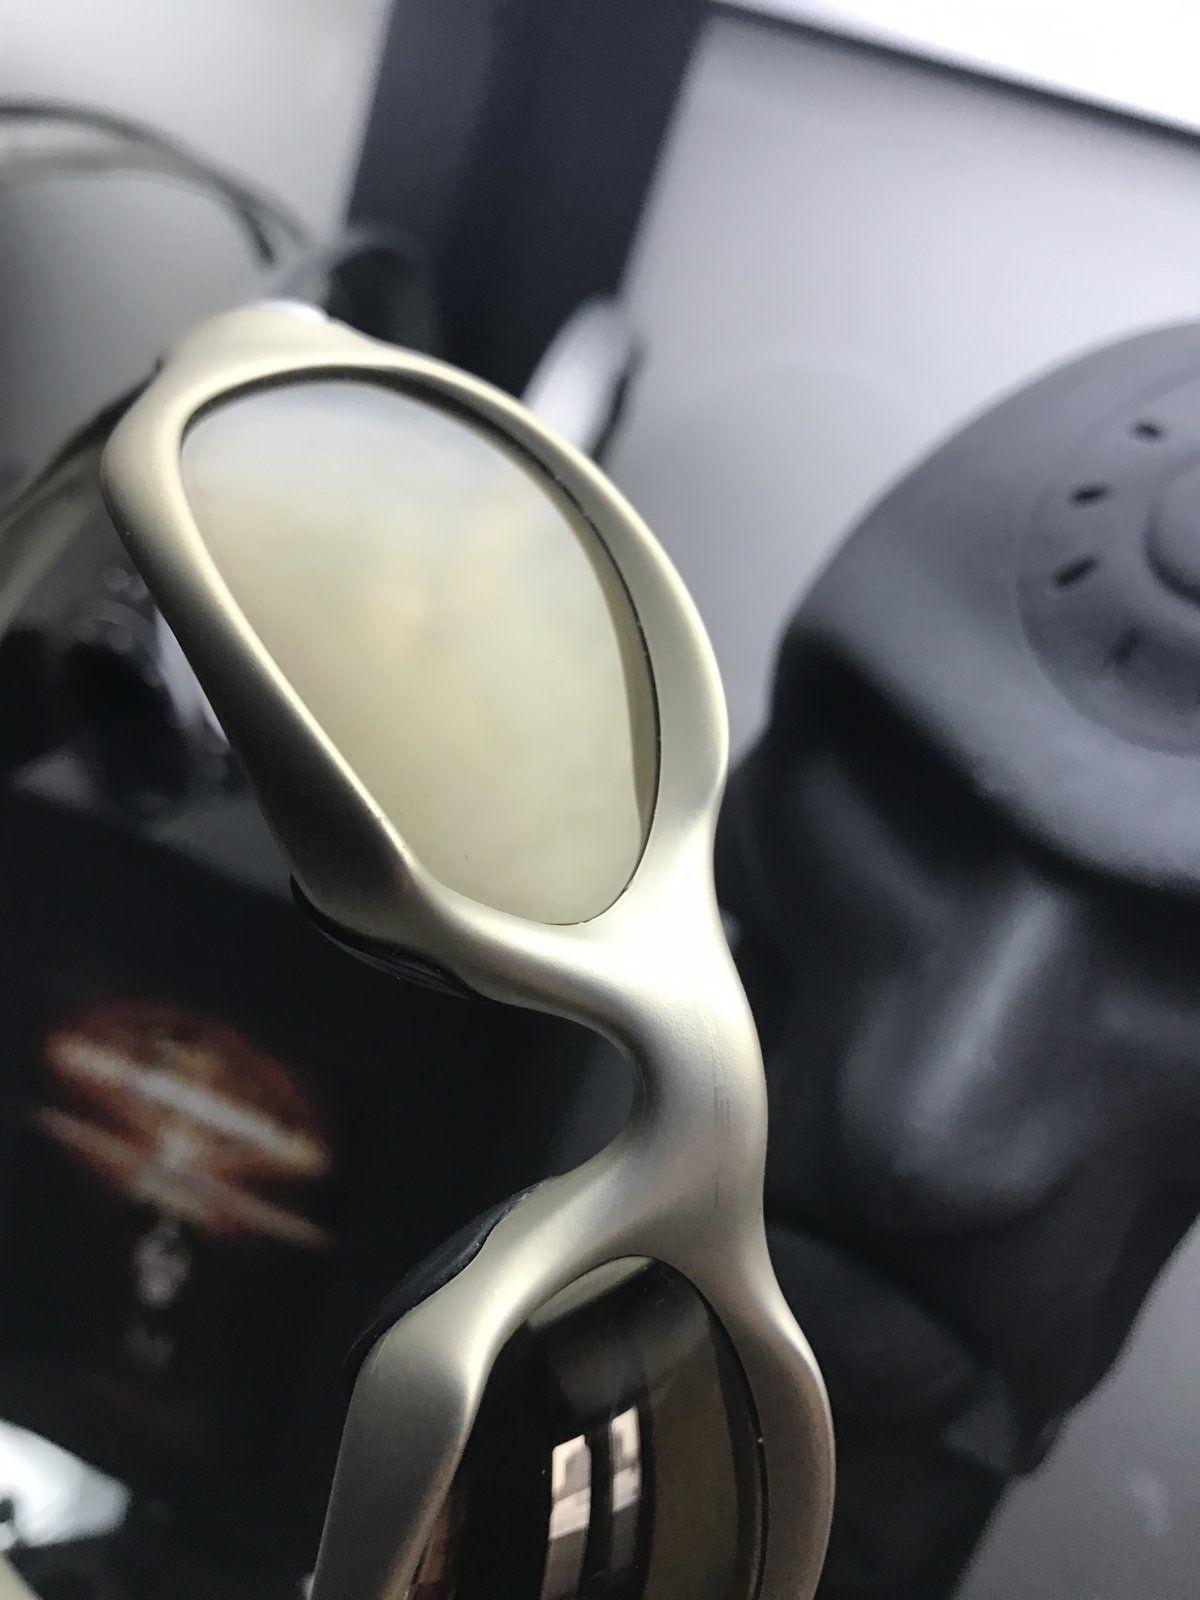 Valve FMJ Platinum - FMJ+ w/ gold iridium - $110 - IMG_6357.JPG